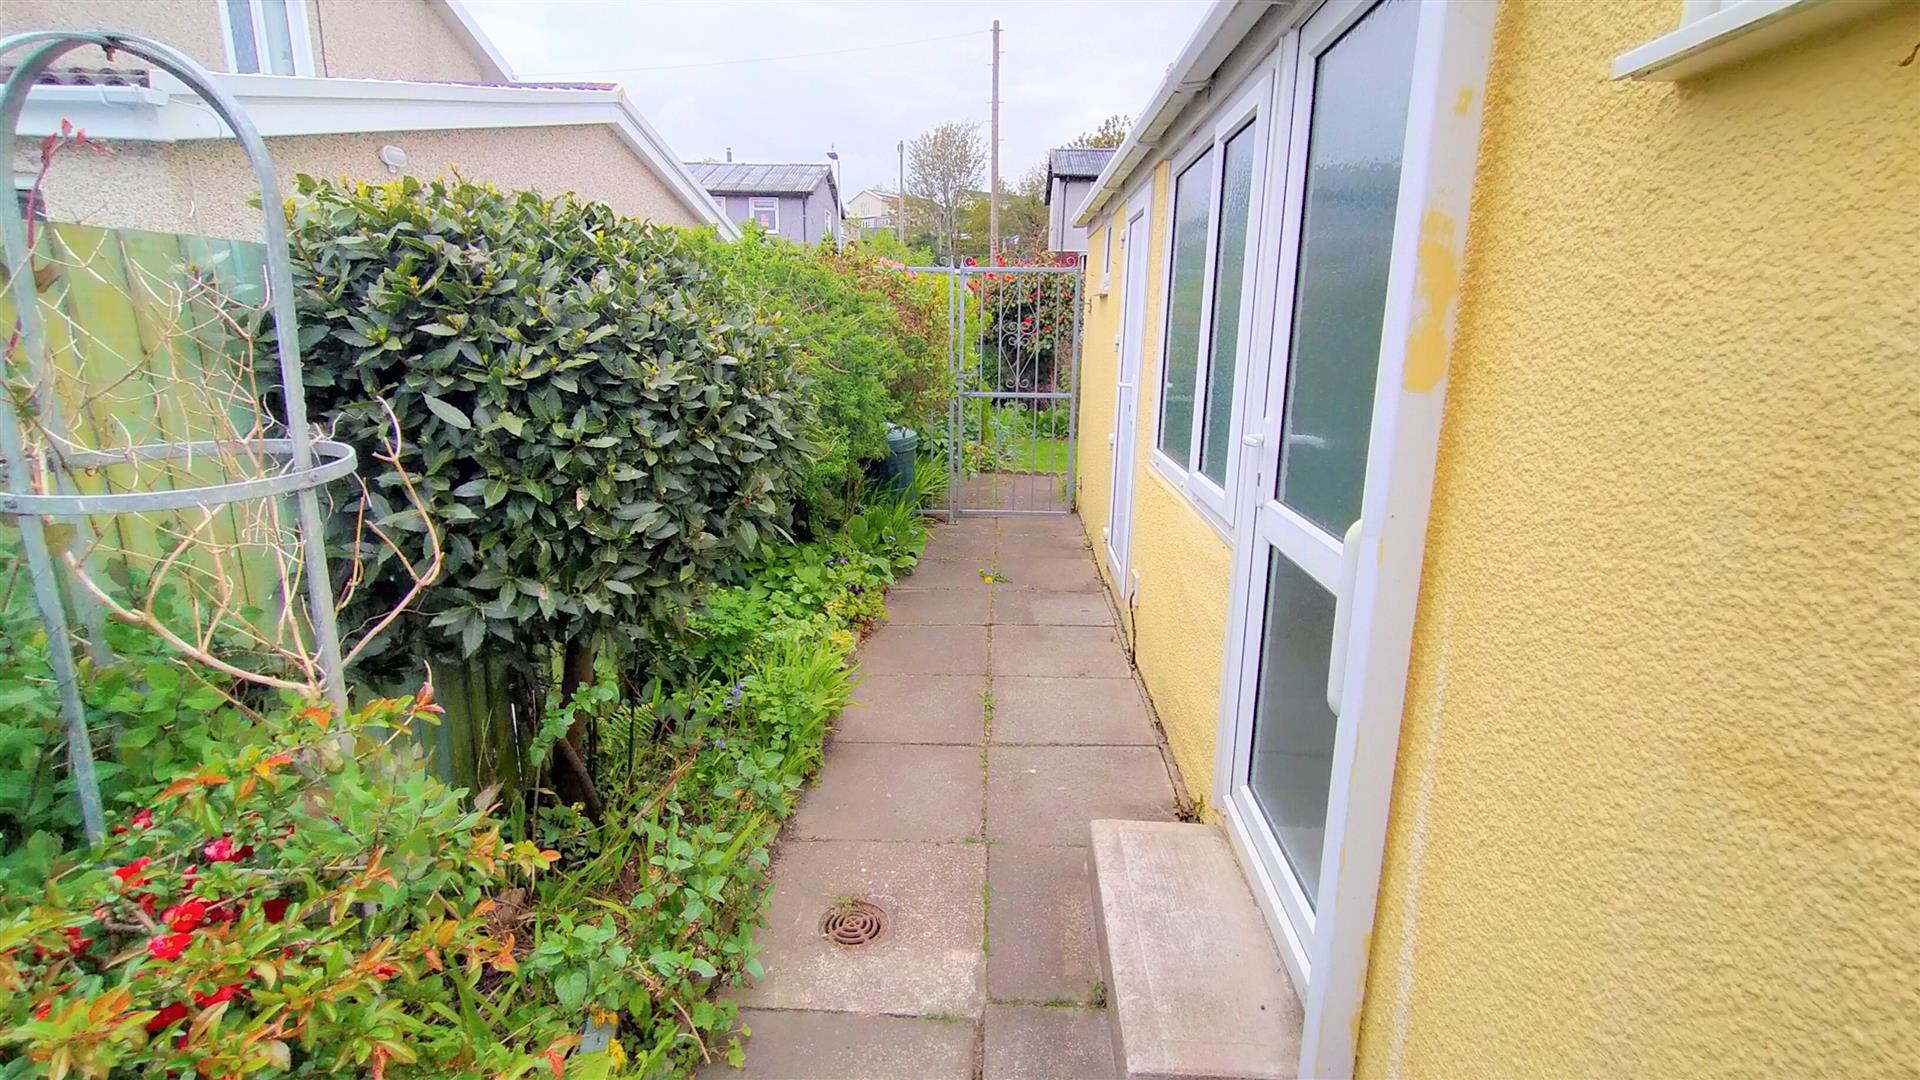 Acacia Road, West Cross, Swansea, SA3 5LF